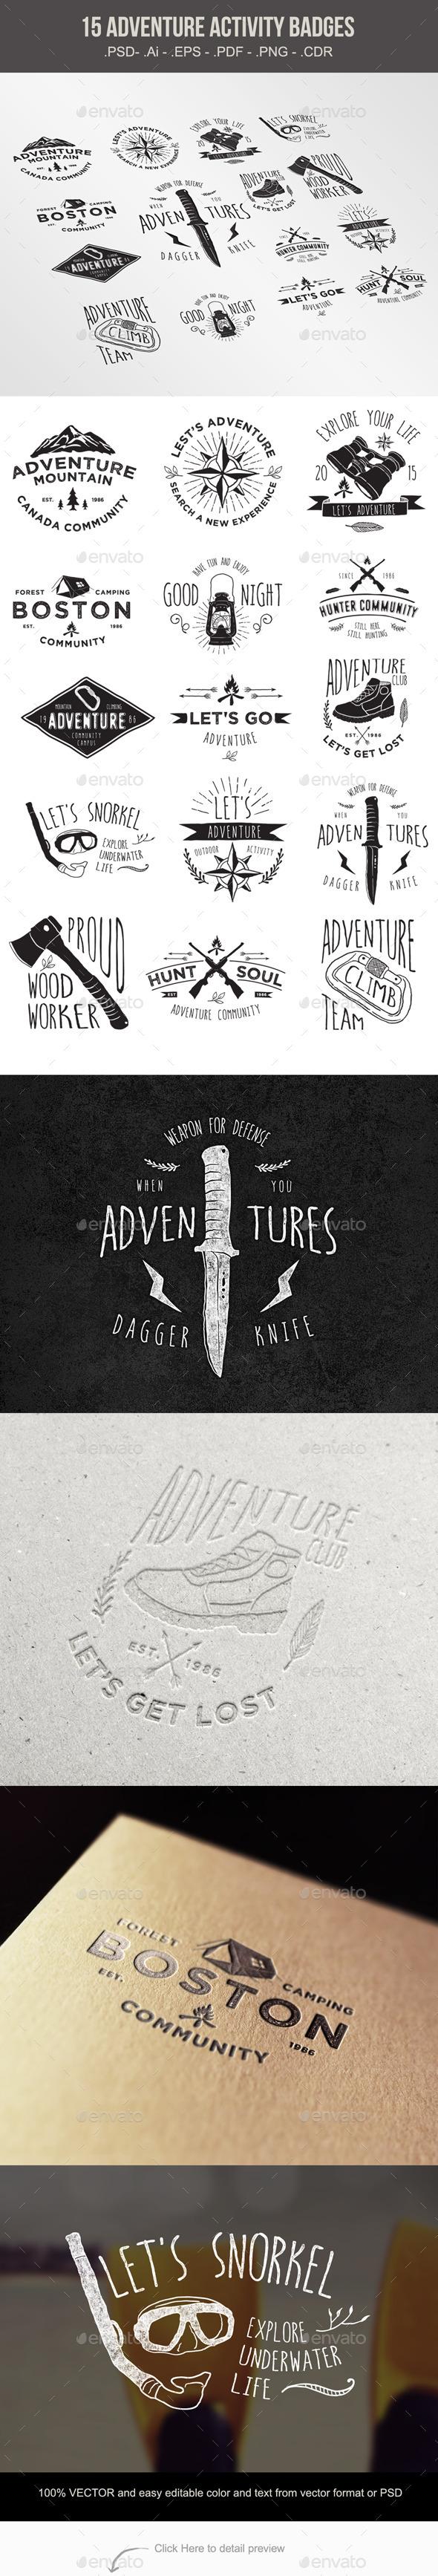 15 Adventure Activity Badges - Sports/Activity Conceptual